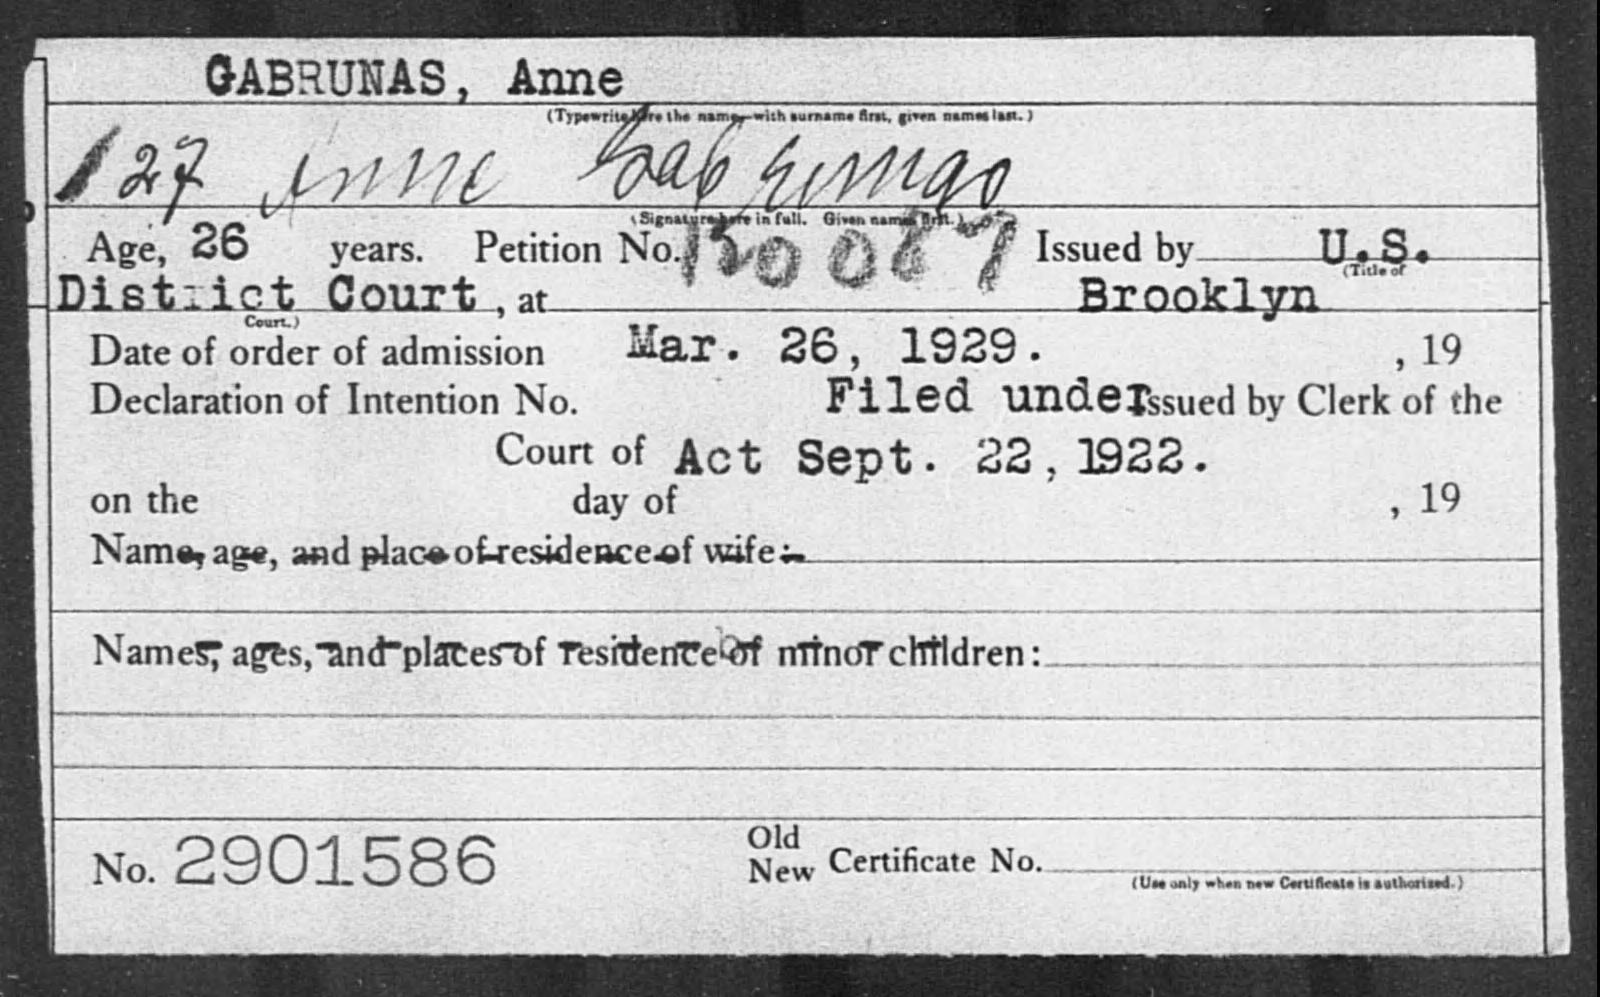 GABRUNAS, Anne - Born: [BLANK], Naturalized: 1929